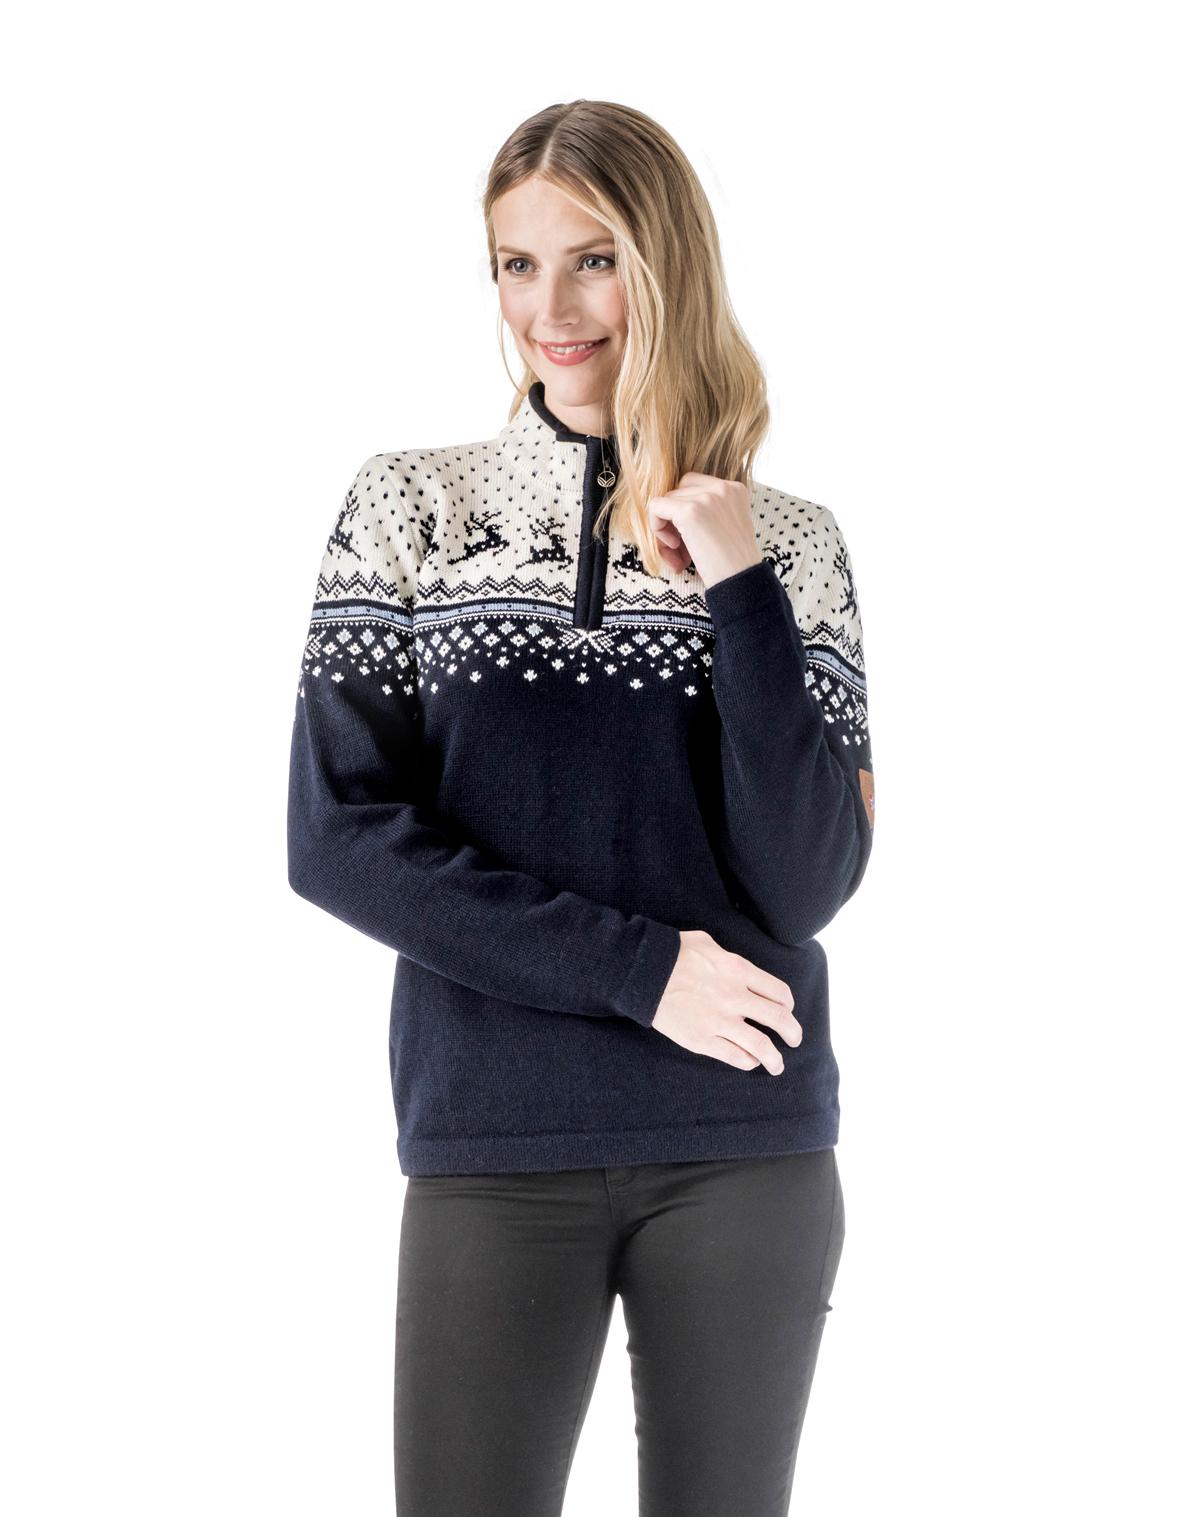 Tuva Sweater